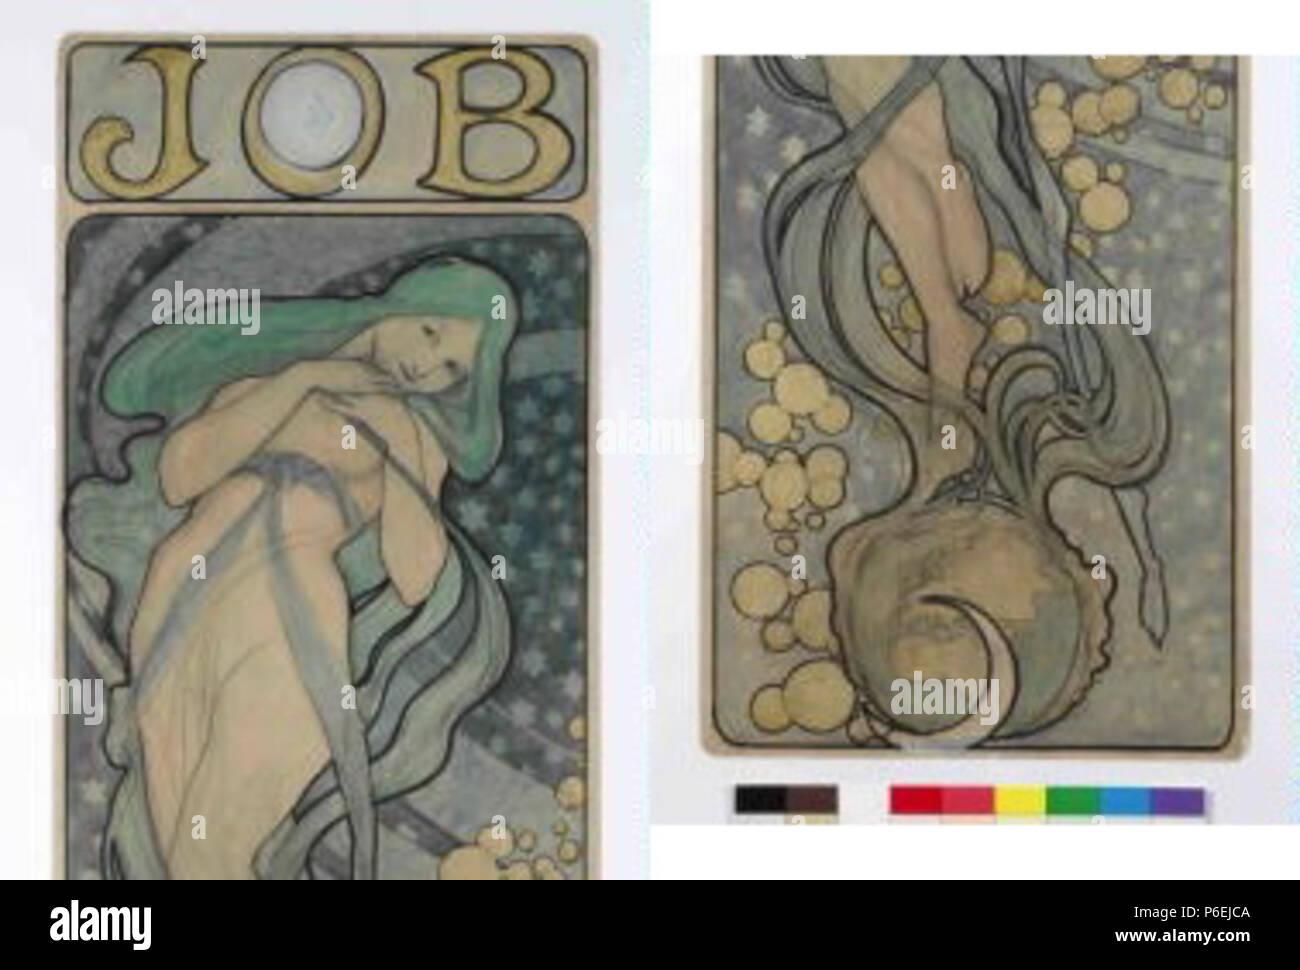 . Eština: Návrh na plakát lavoro circa 1897 6 Autor Alfons Mucha 24.7.1860-14.7.1939 - Navrh na plakat JOB Foto Stock